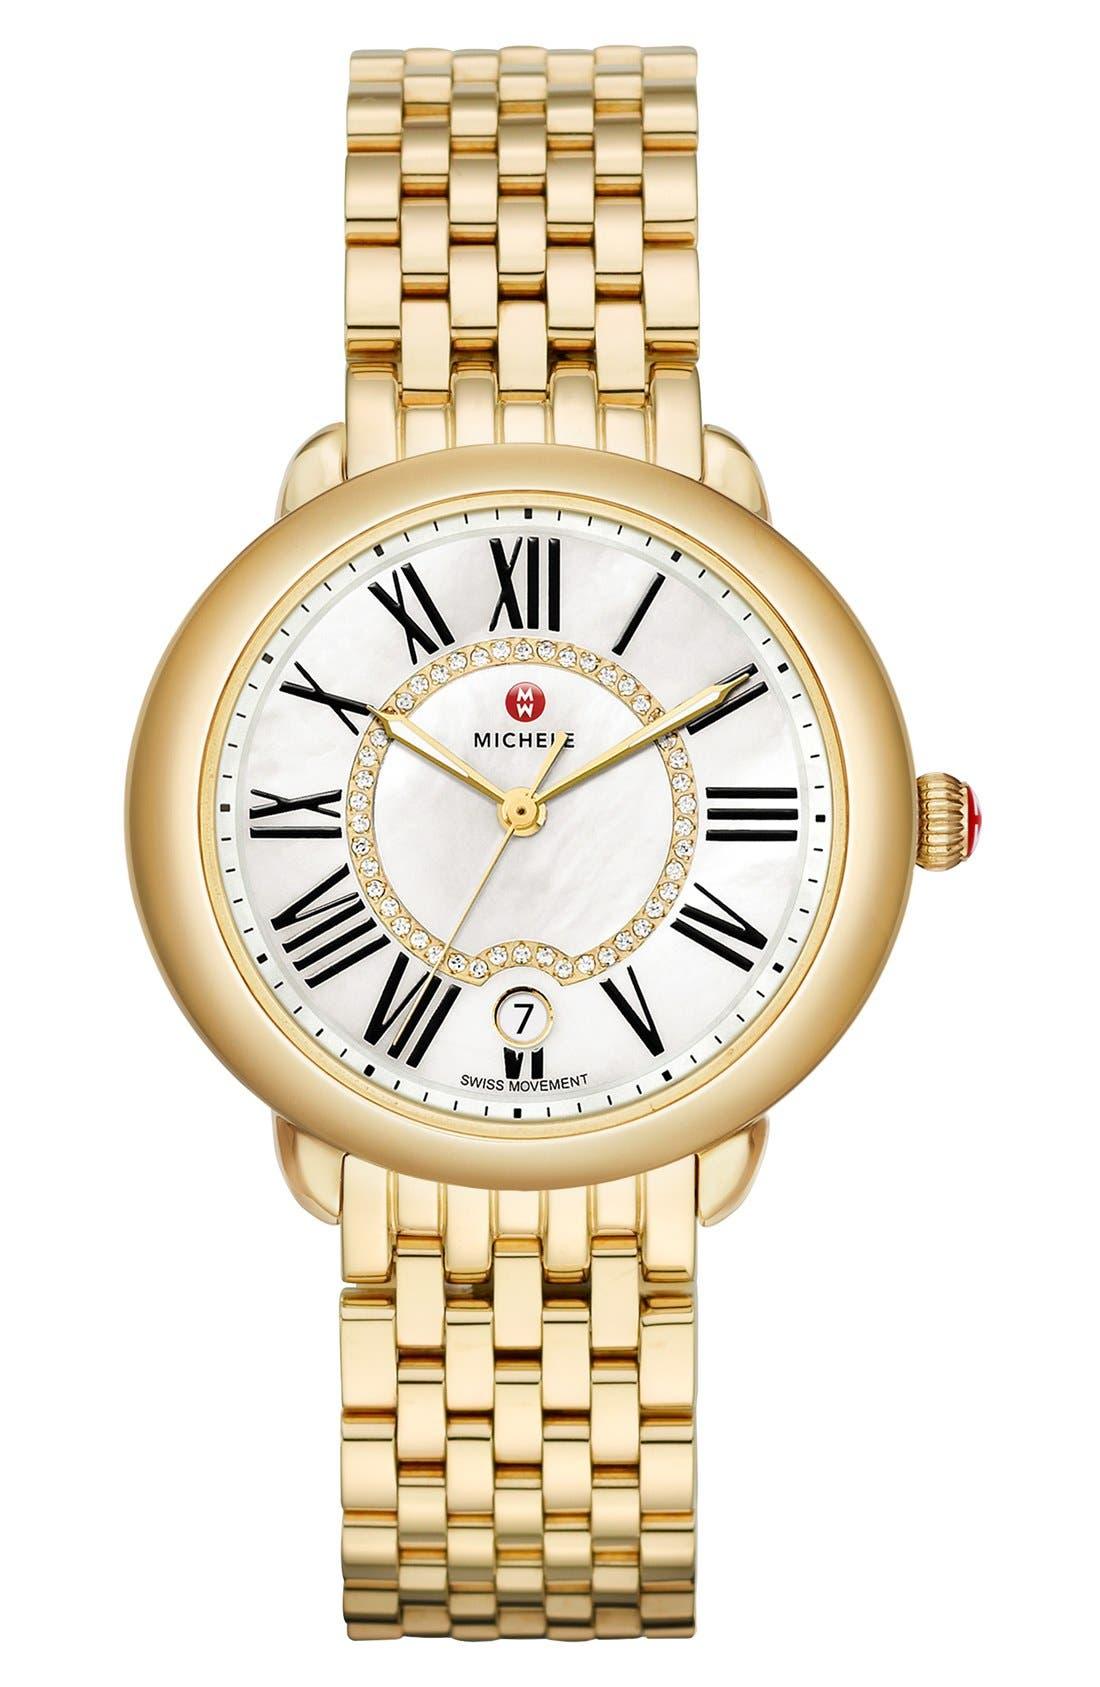 Serein 16mm Gold Plated Bracelet Watchband,                             Alternate thumbnail 5, color,                             GOLD